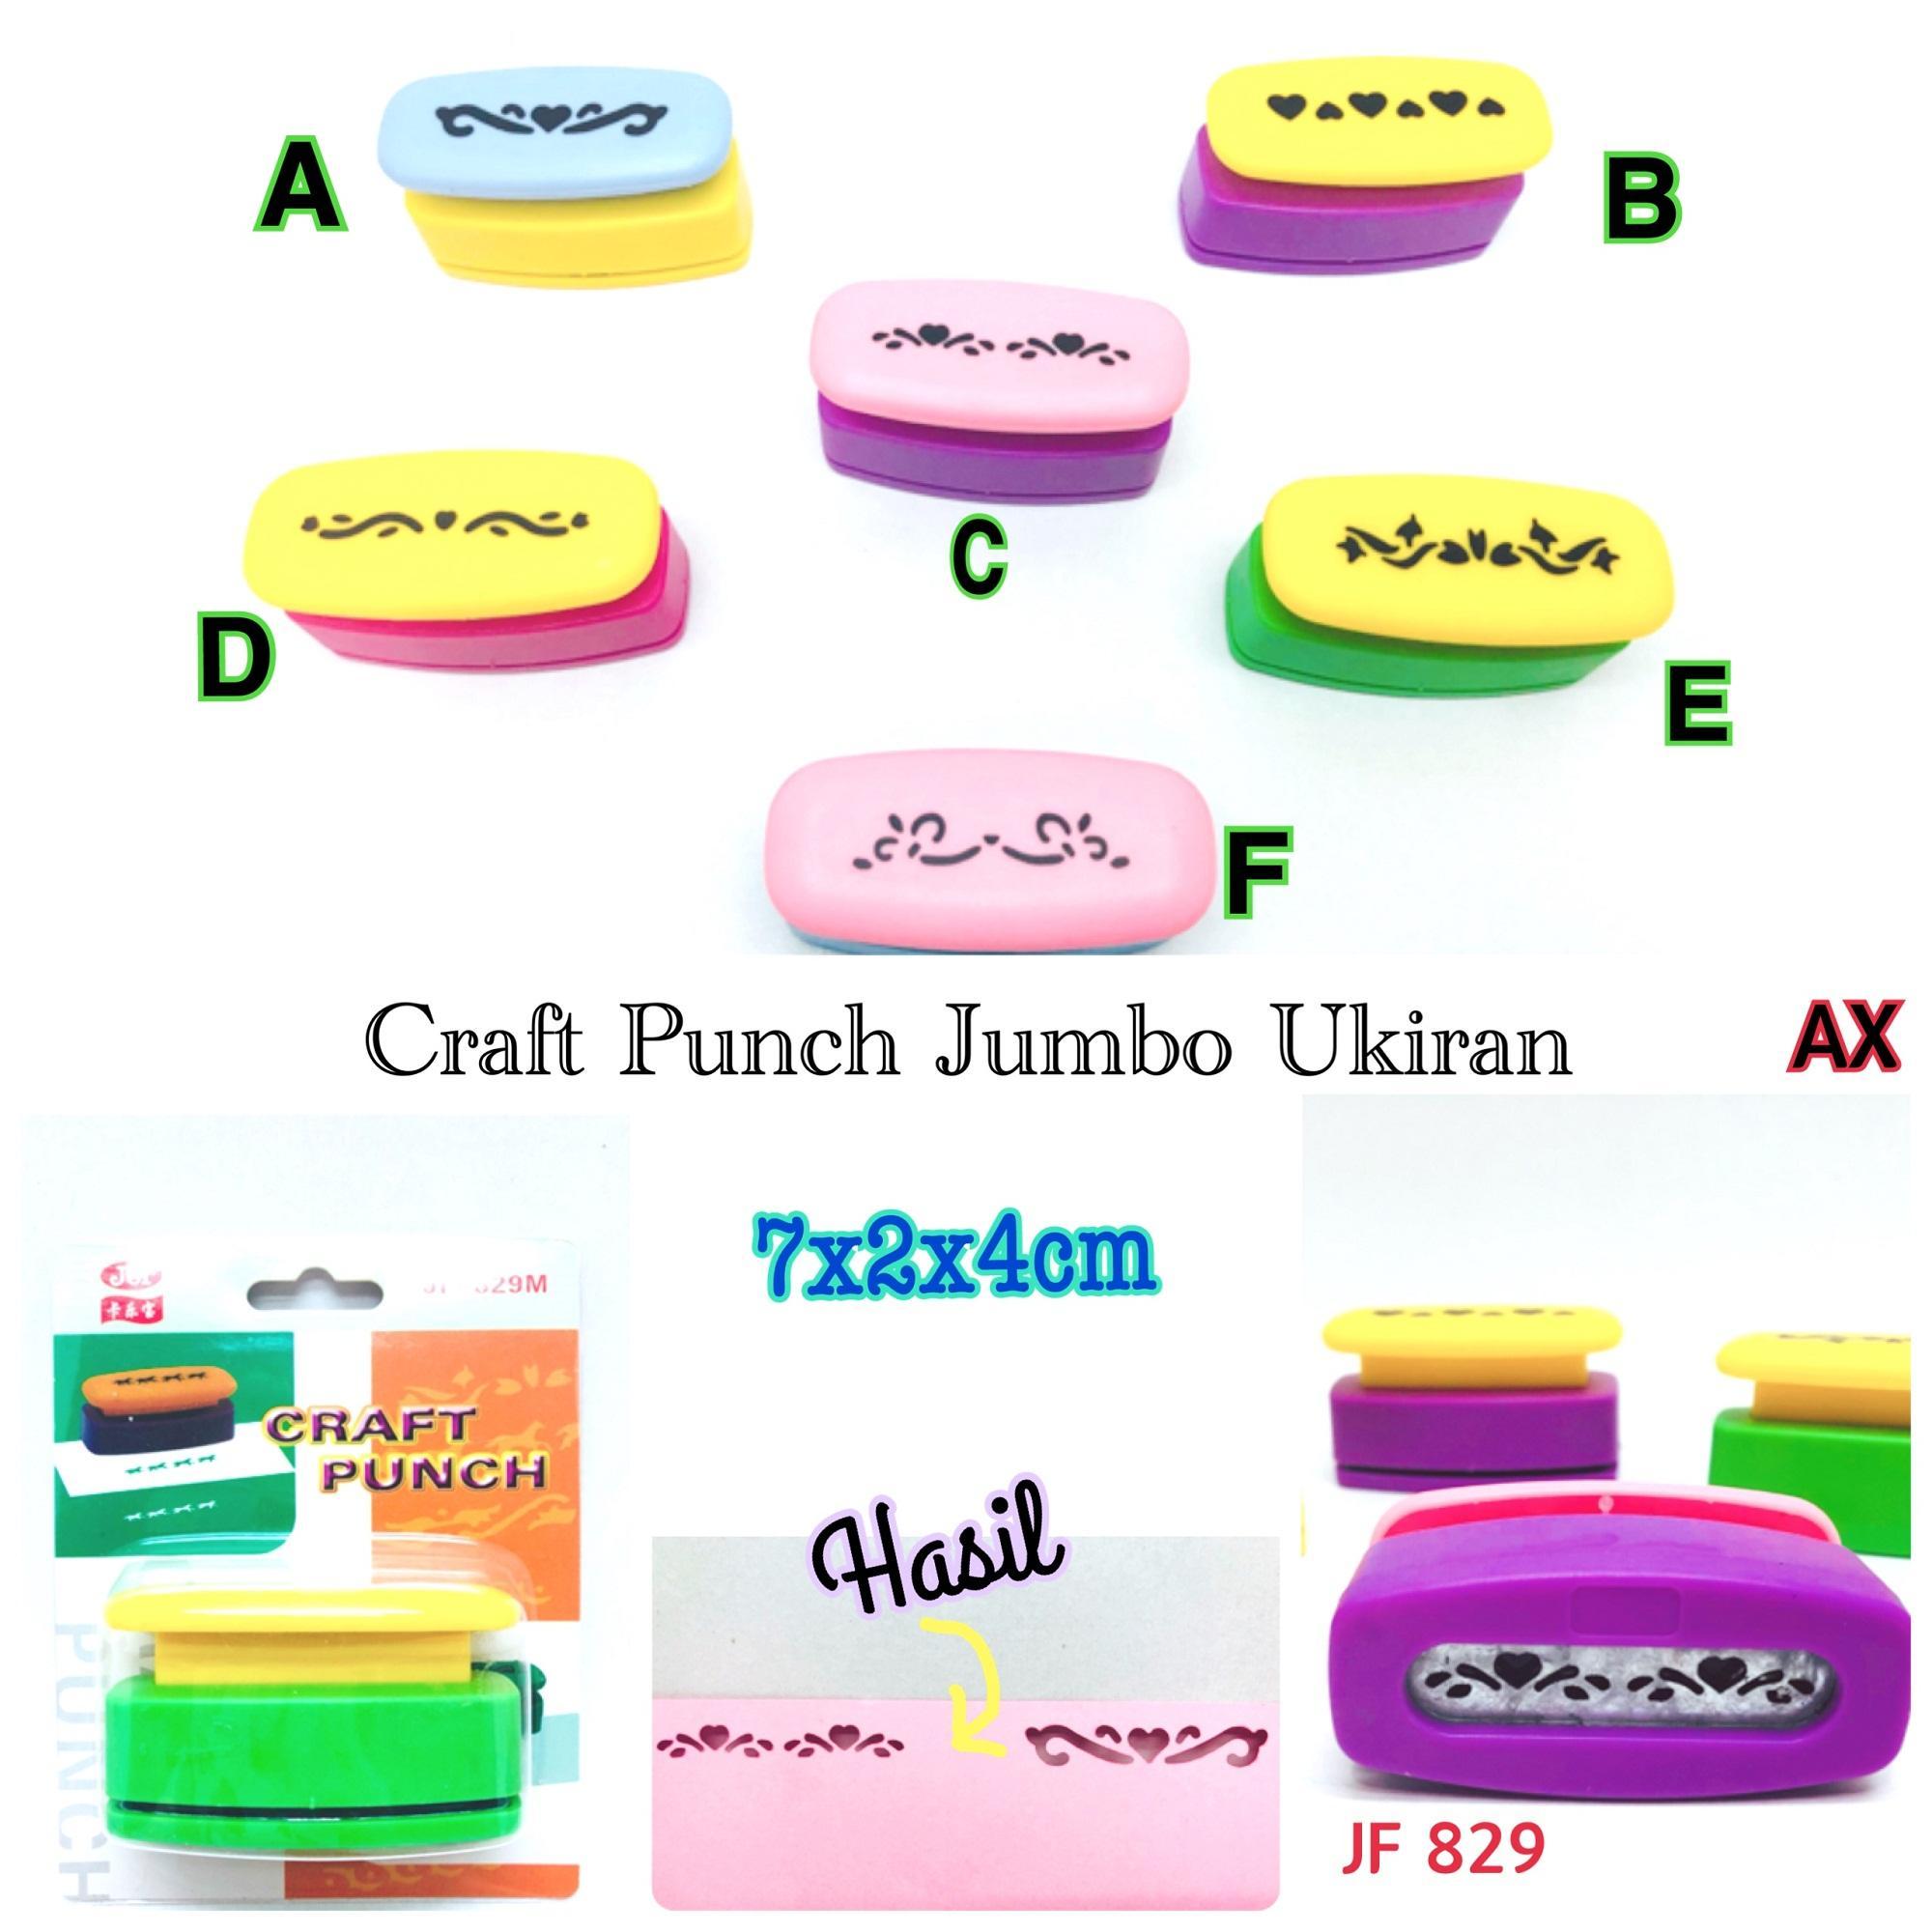 Craft Punch Jumbo Ukiran DIY Mainan Edukasi